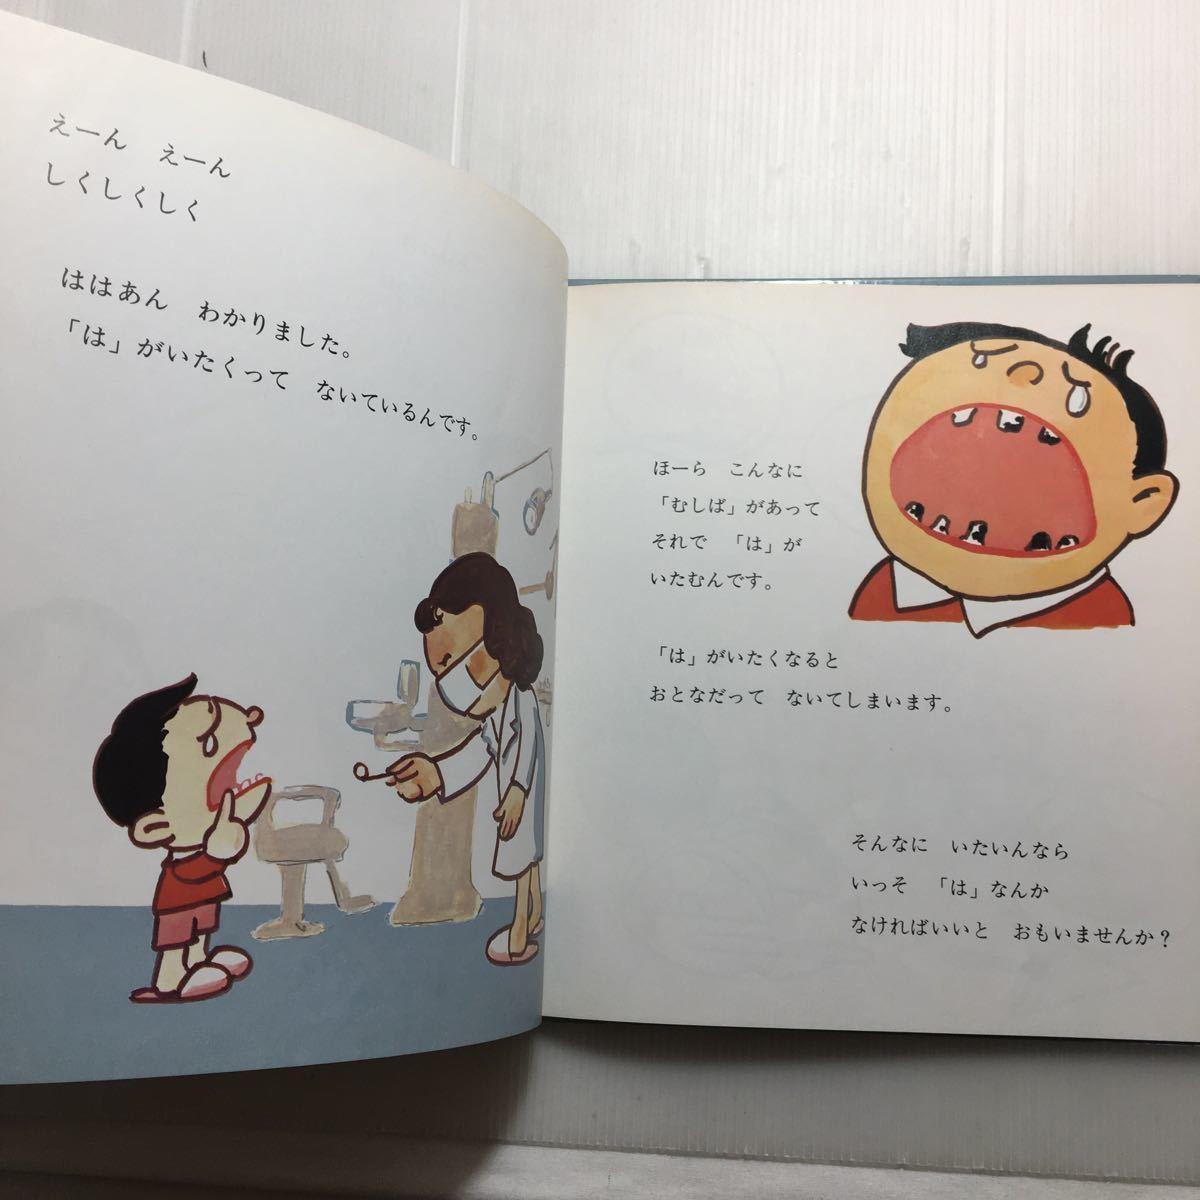 zaa-m1b♪はははのはなし (かがくのとも絵本) 大型本 1972/3/1 加古 里子 (著, イラスト) 2